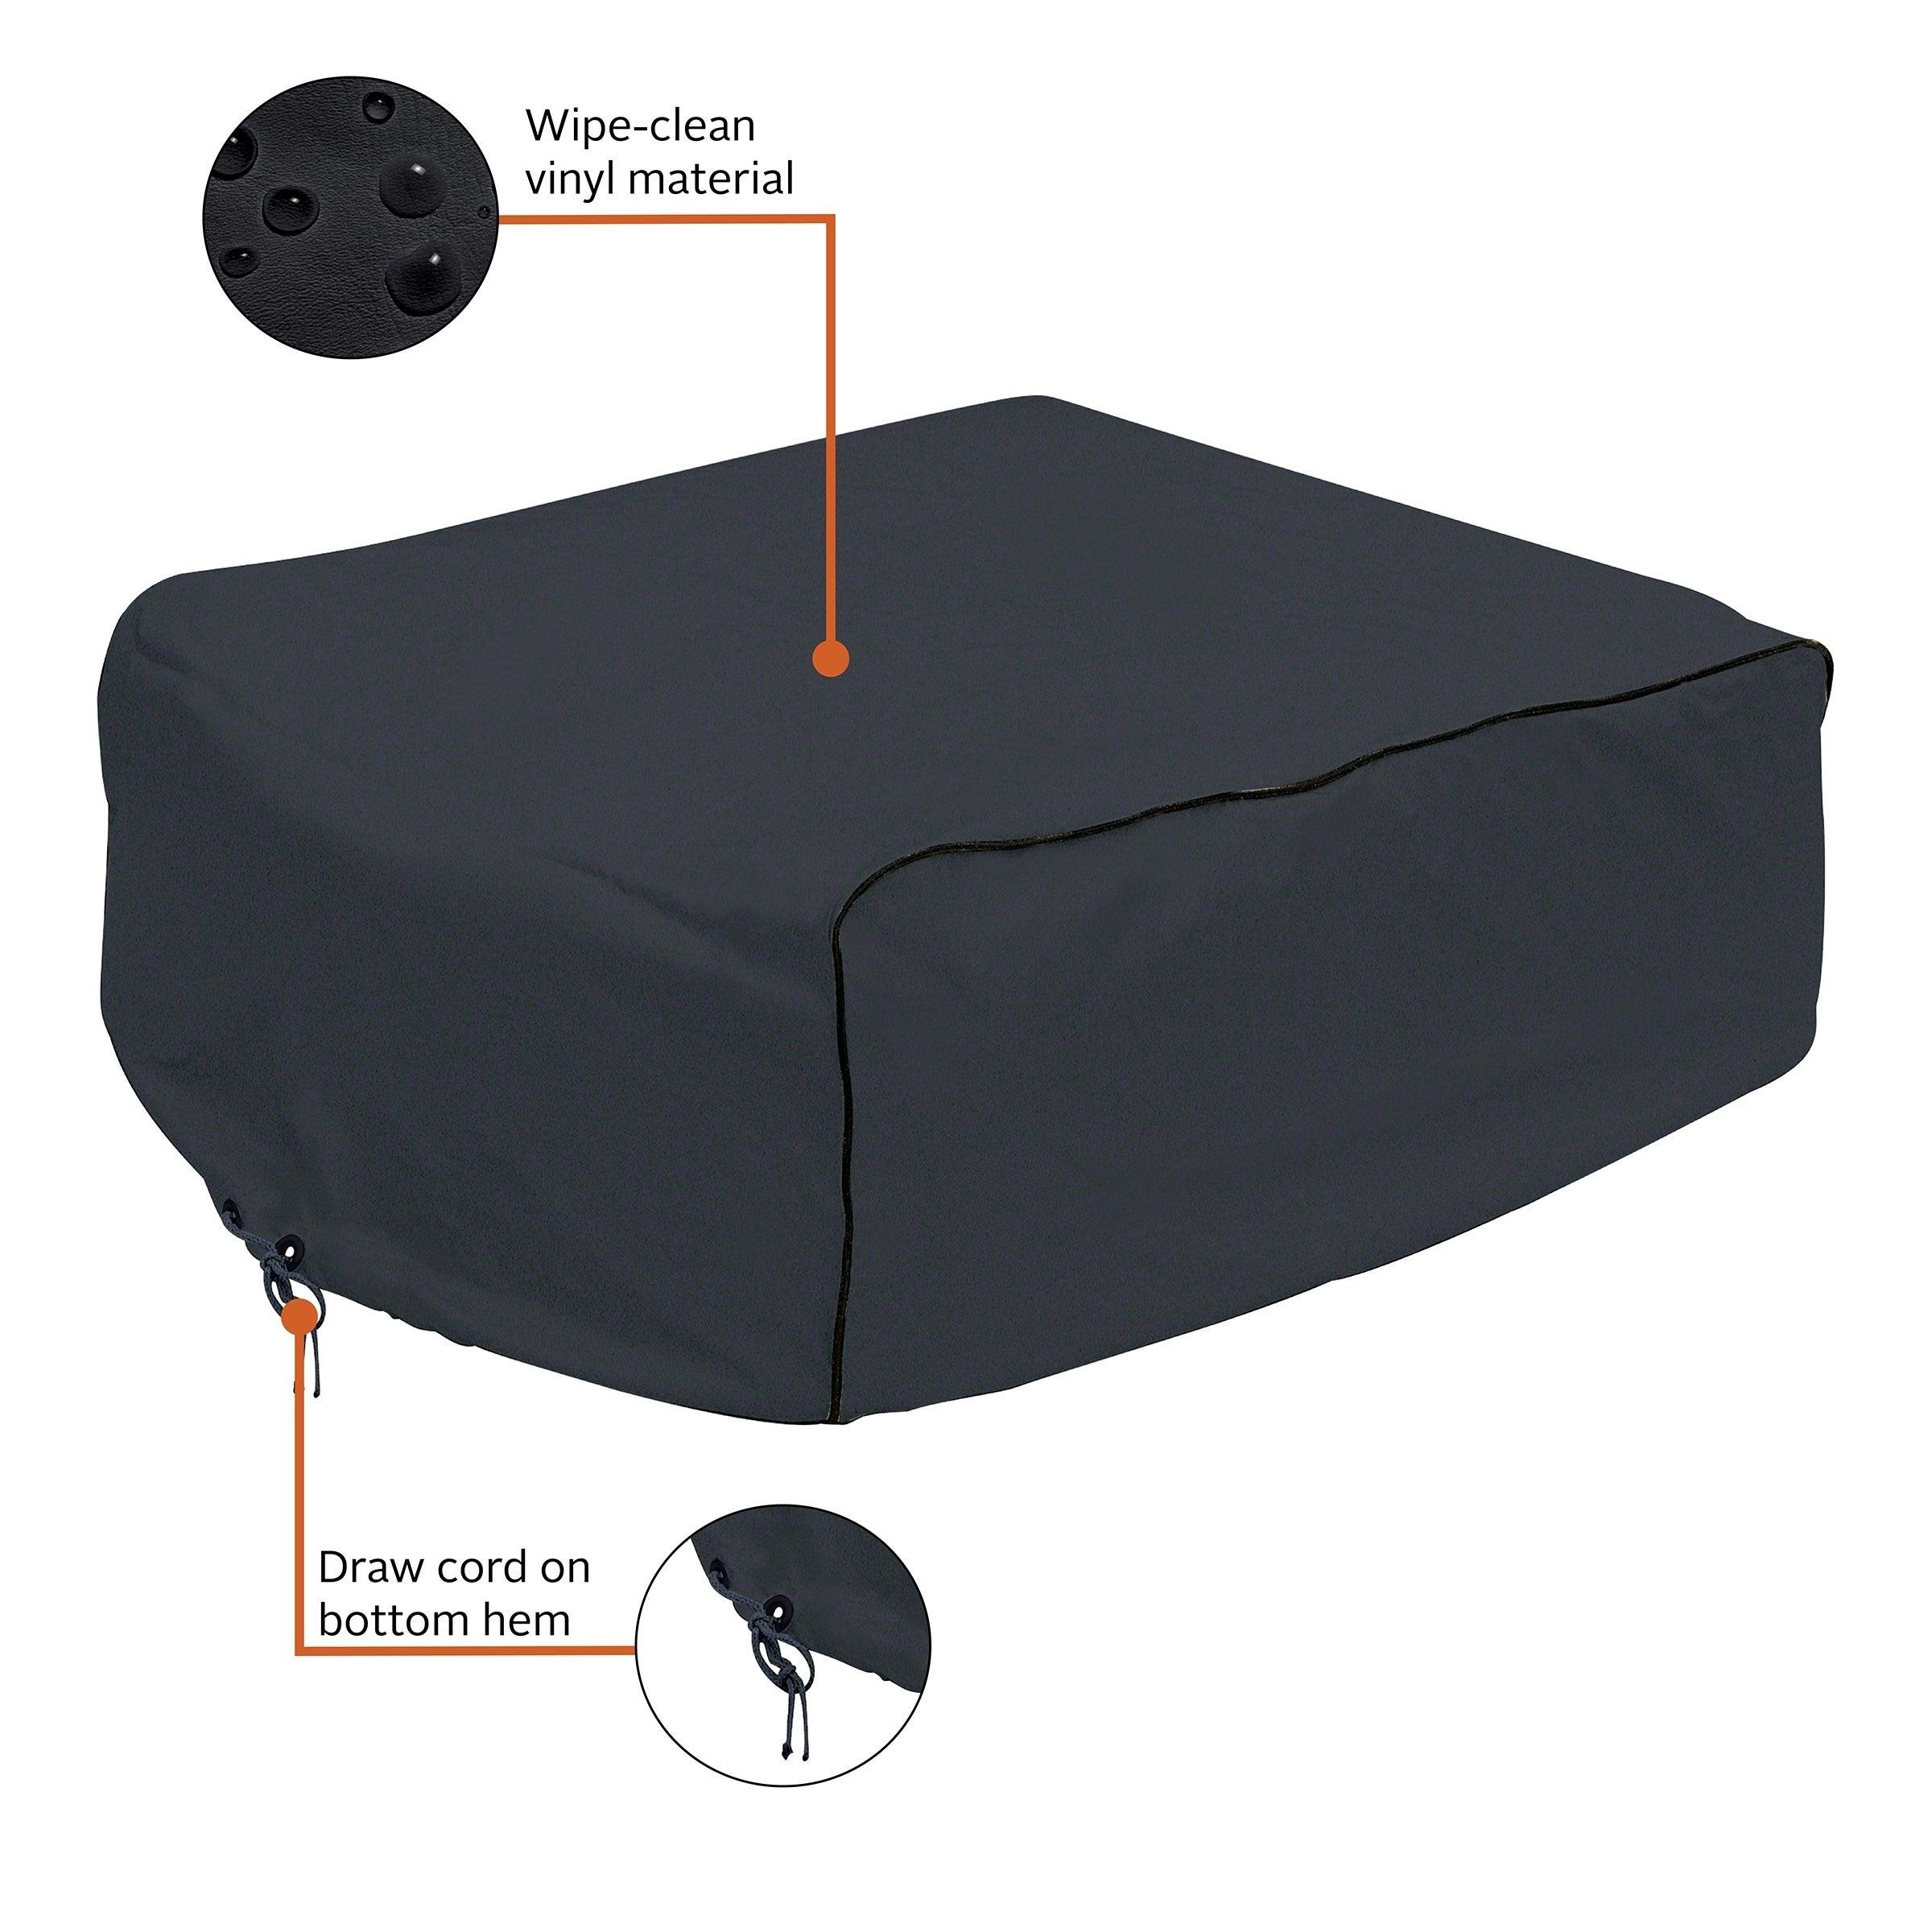 Classic 80-232-150401-00 RV Air Conditioner Cover, Black